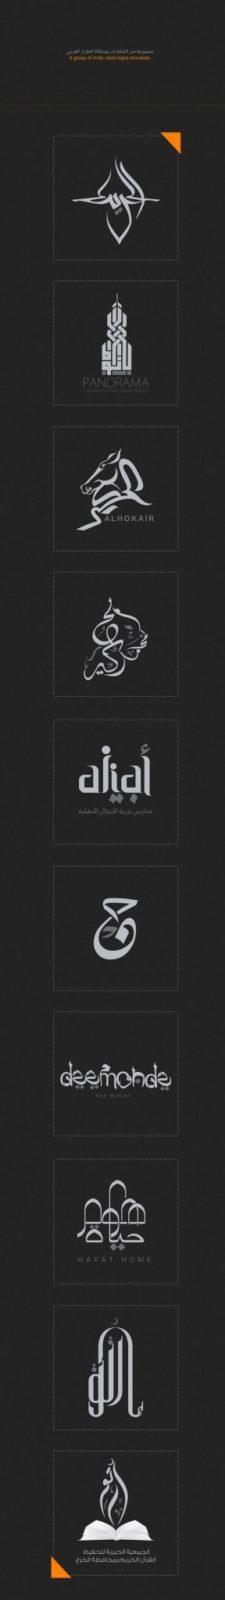 arabic-logo-19